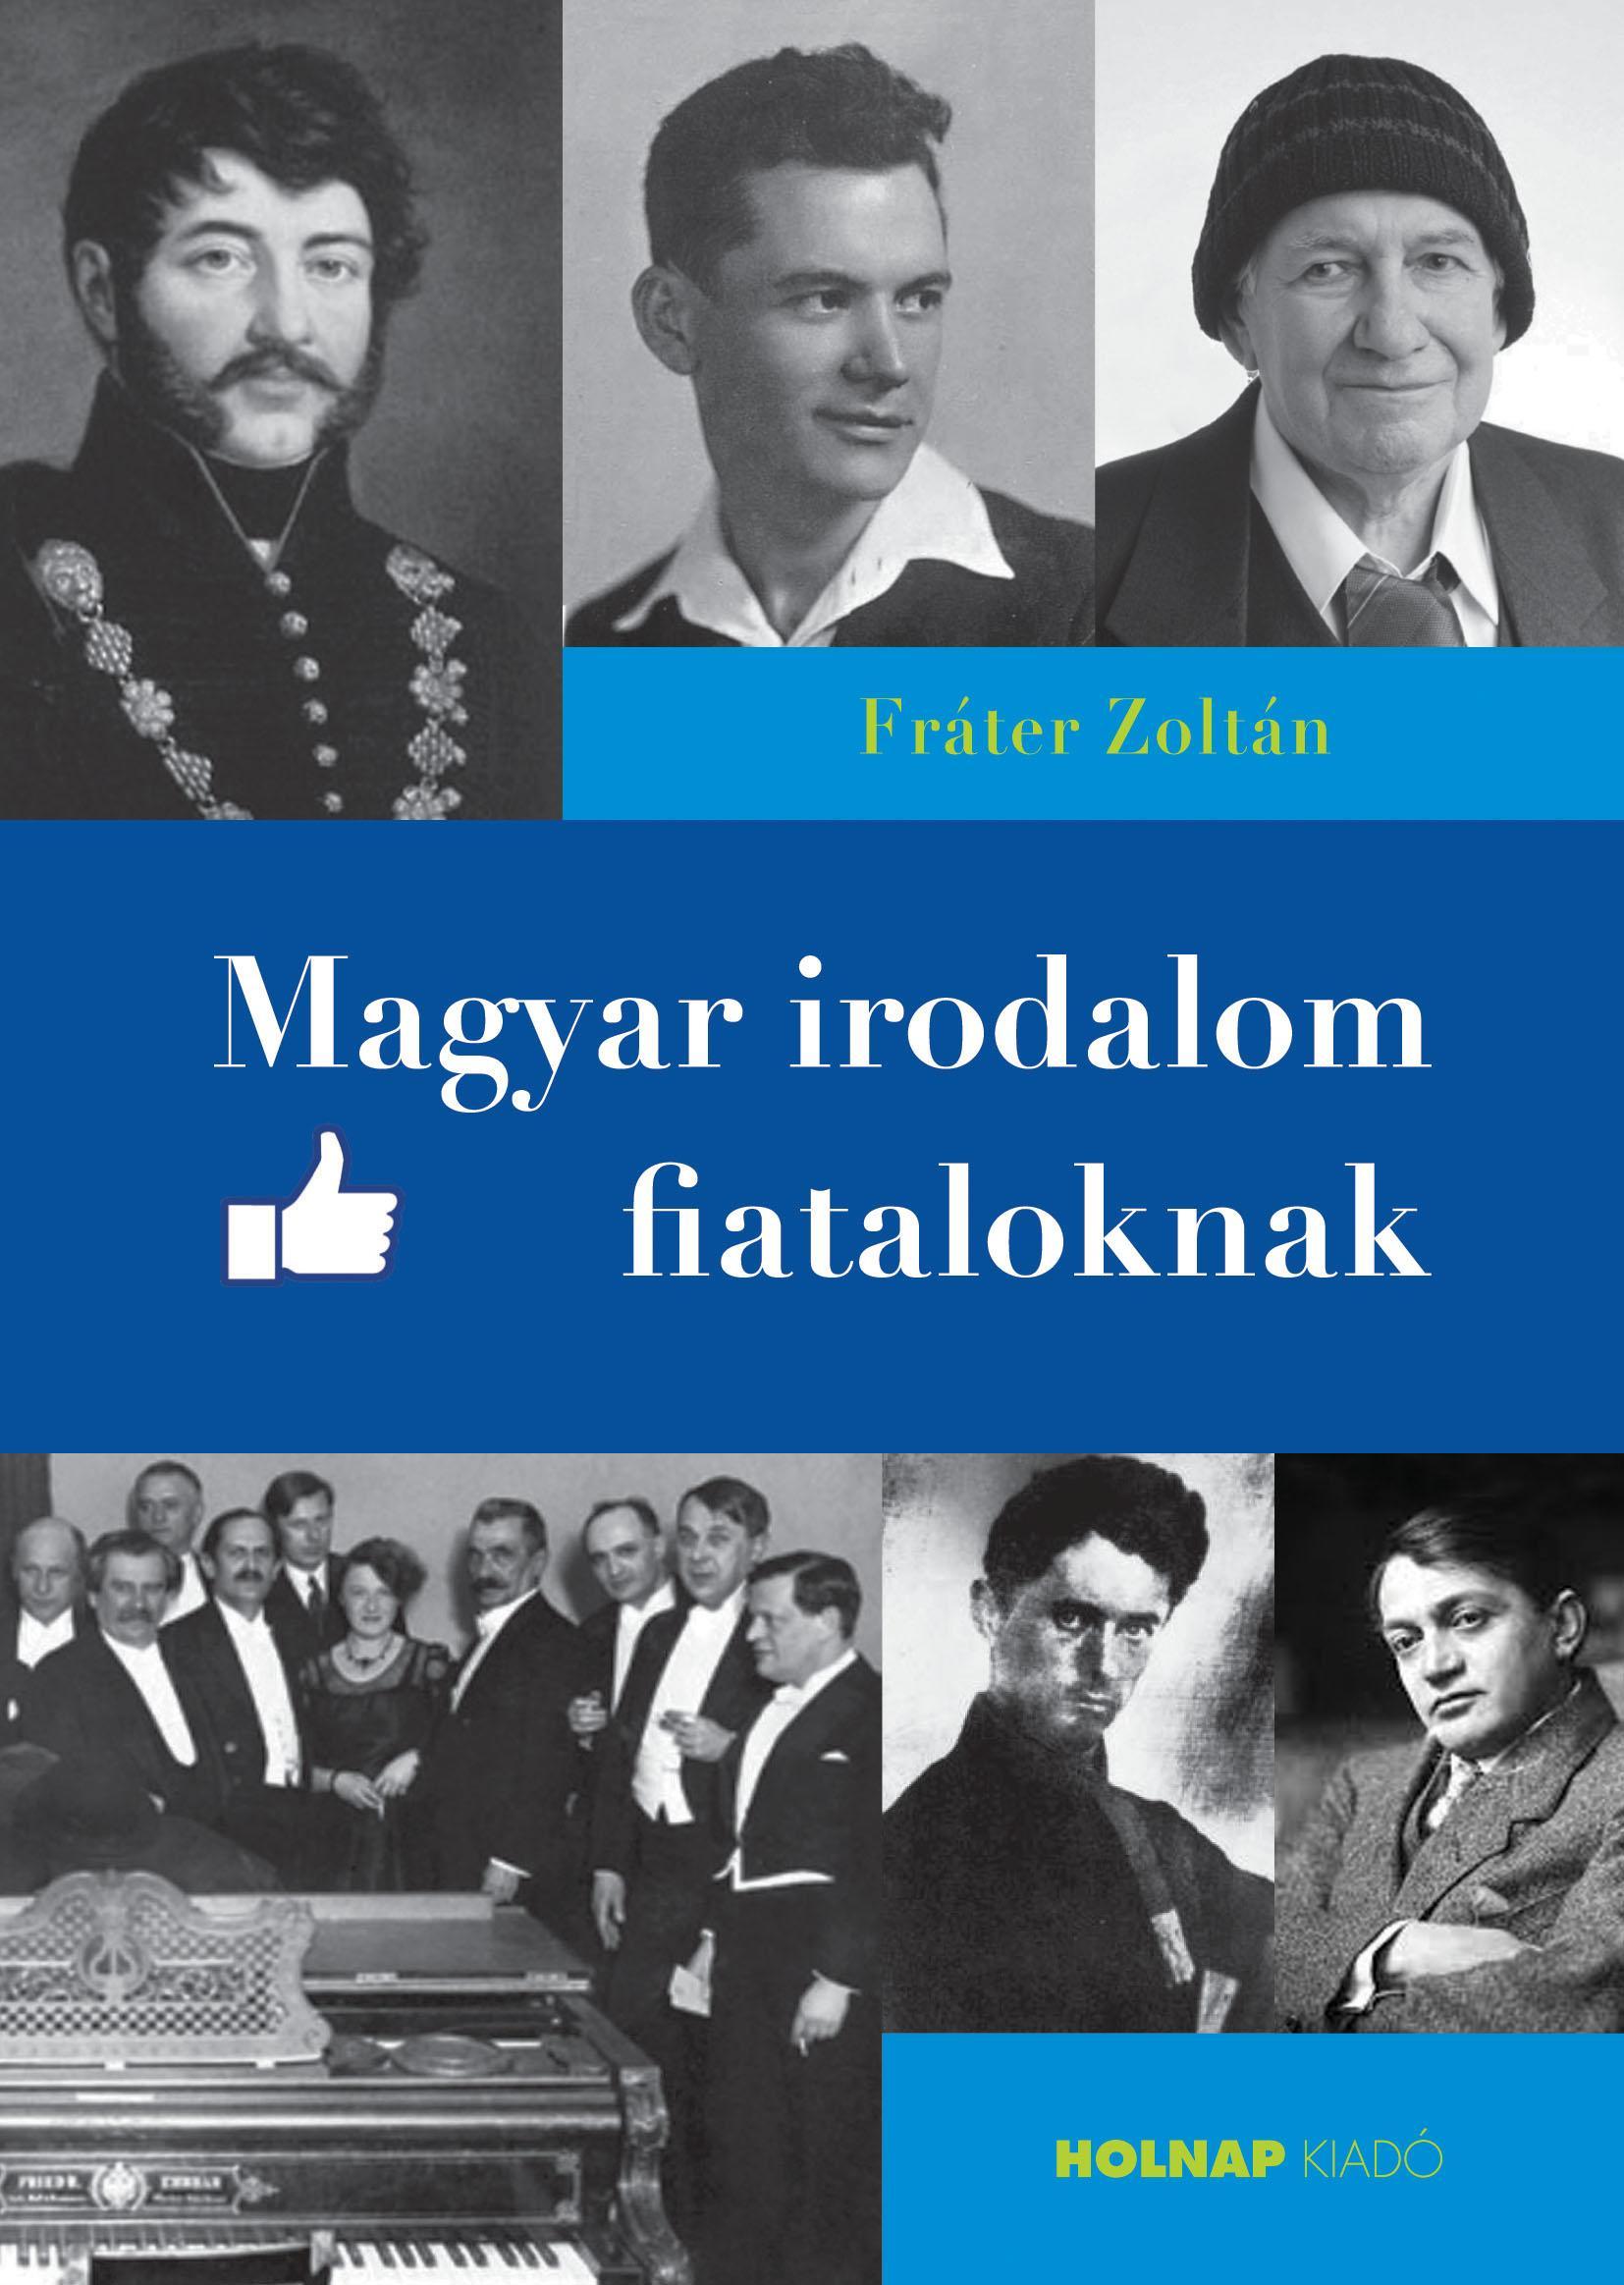 MAGYAR IRODALOM FIATALOKNAK - ÜKH 2016